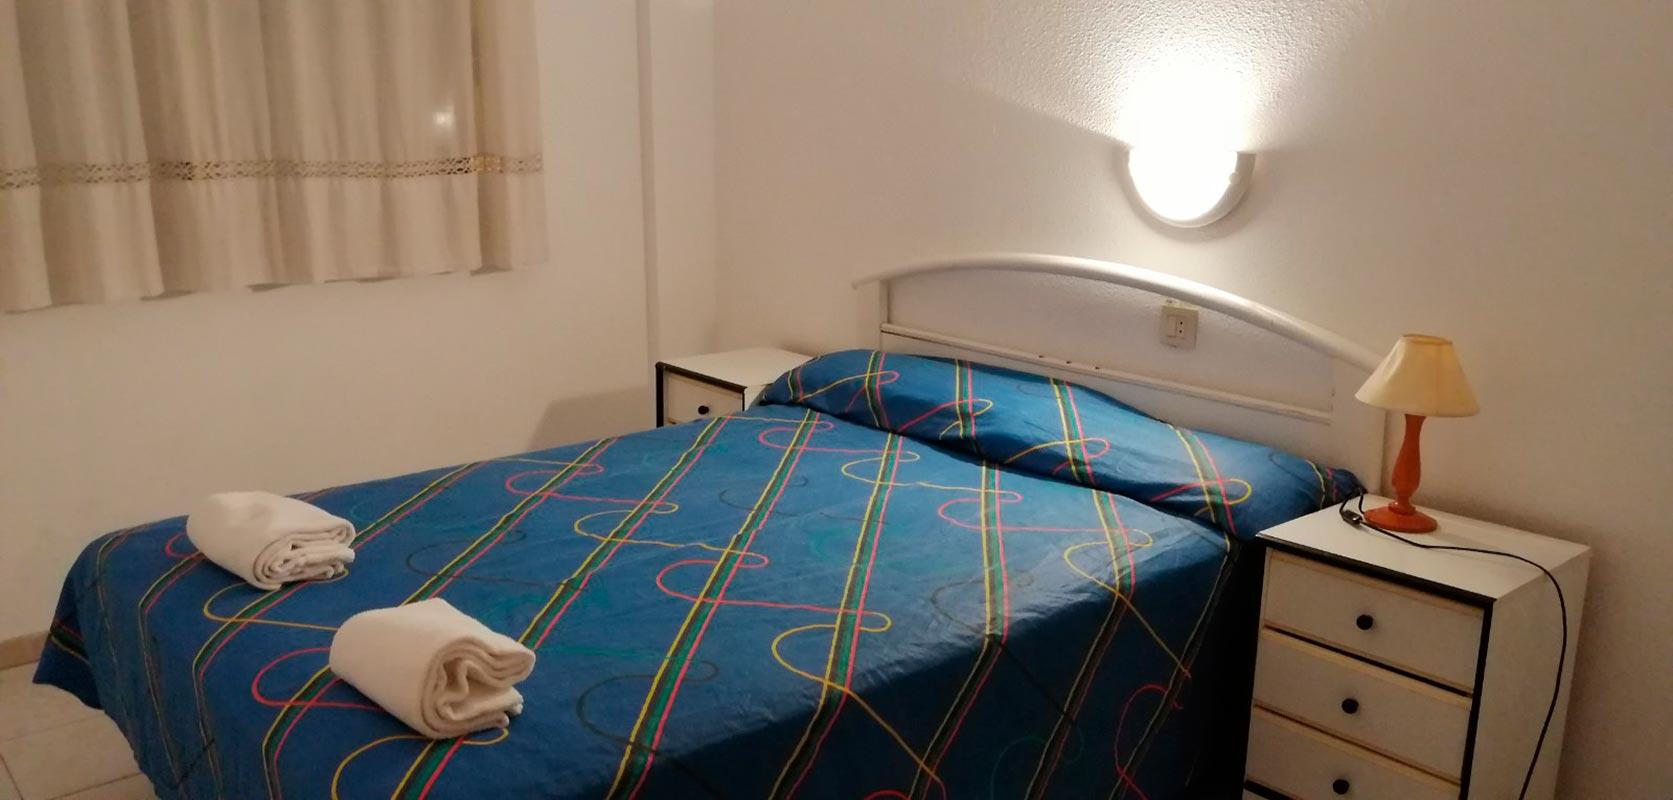 apartamento-por-reformar_6